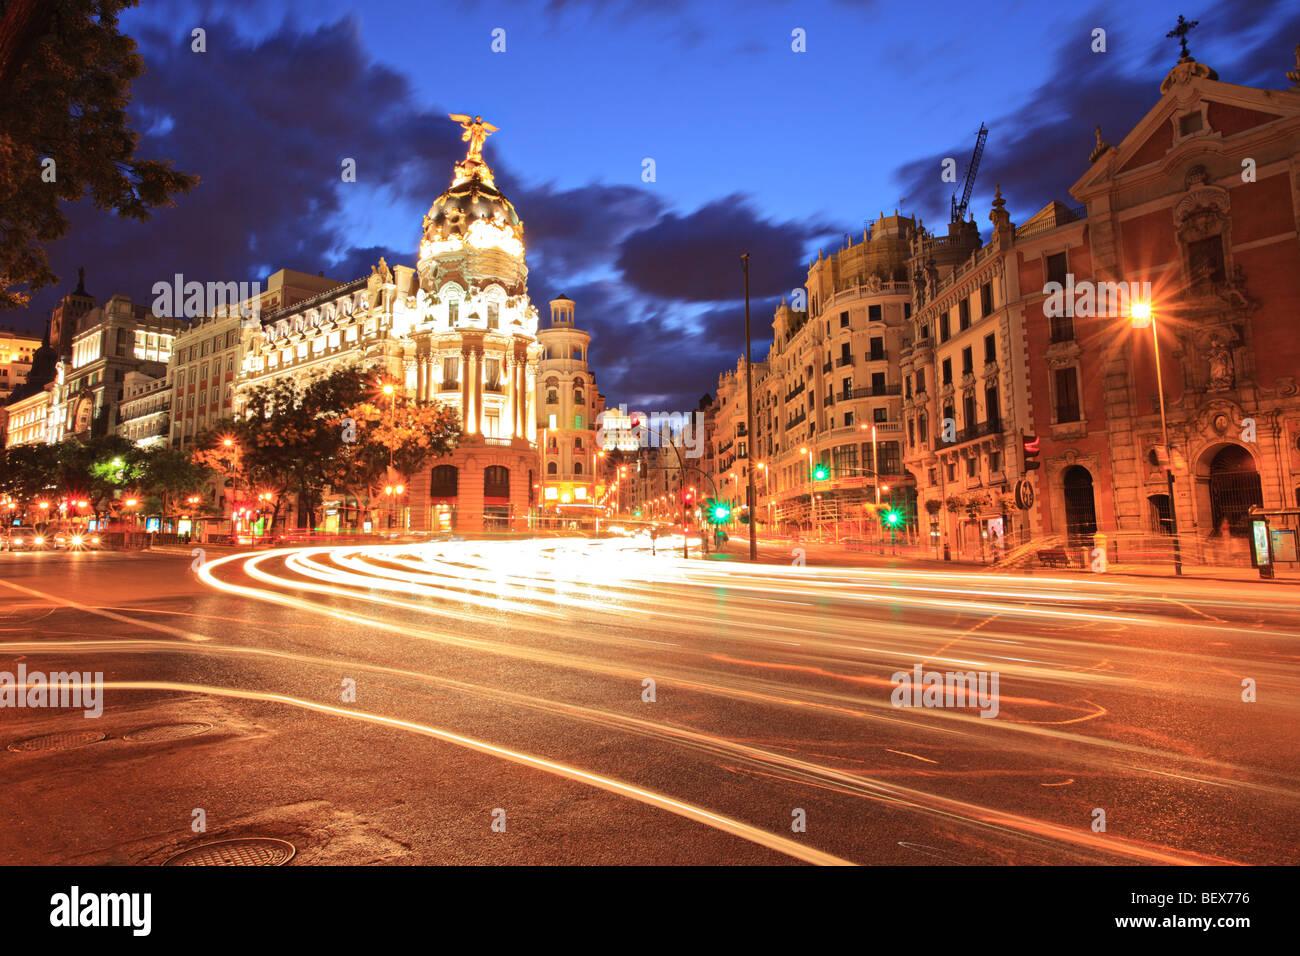 Gran via street in Madrid, Spain at night - Stock Image